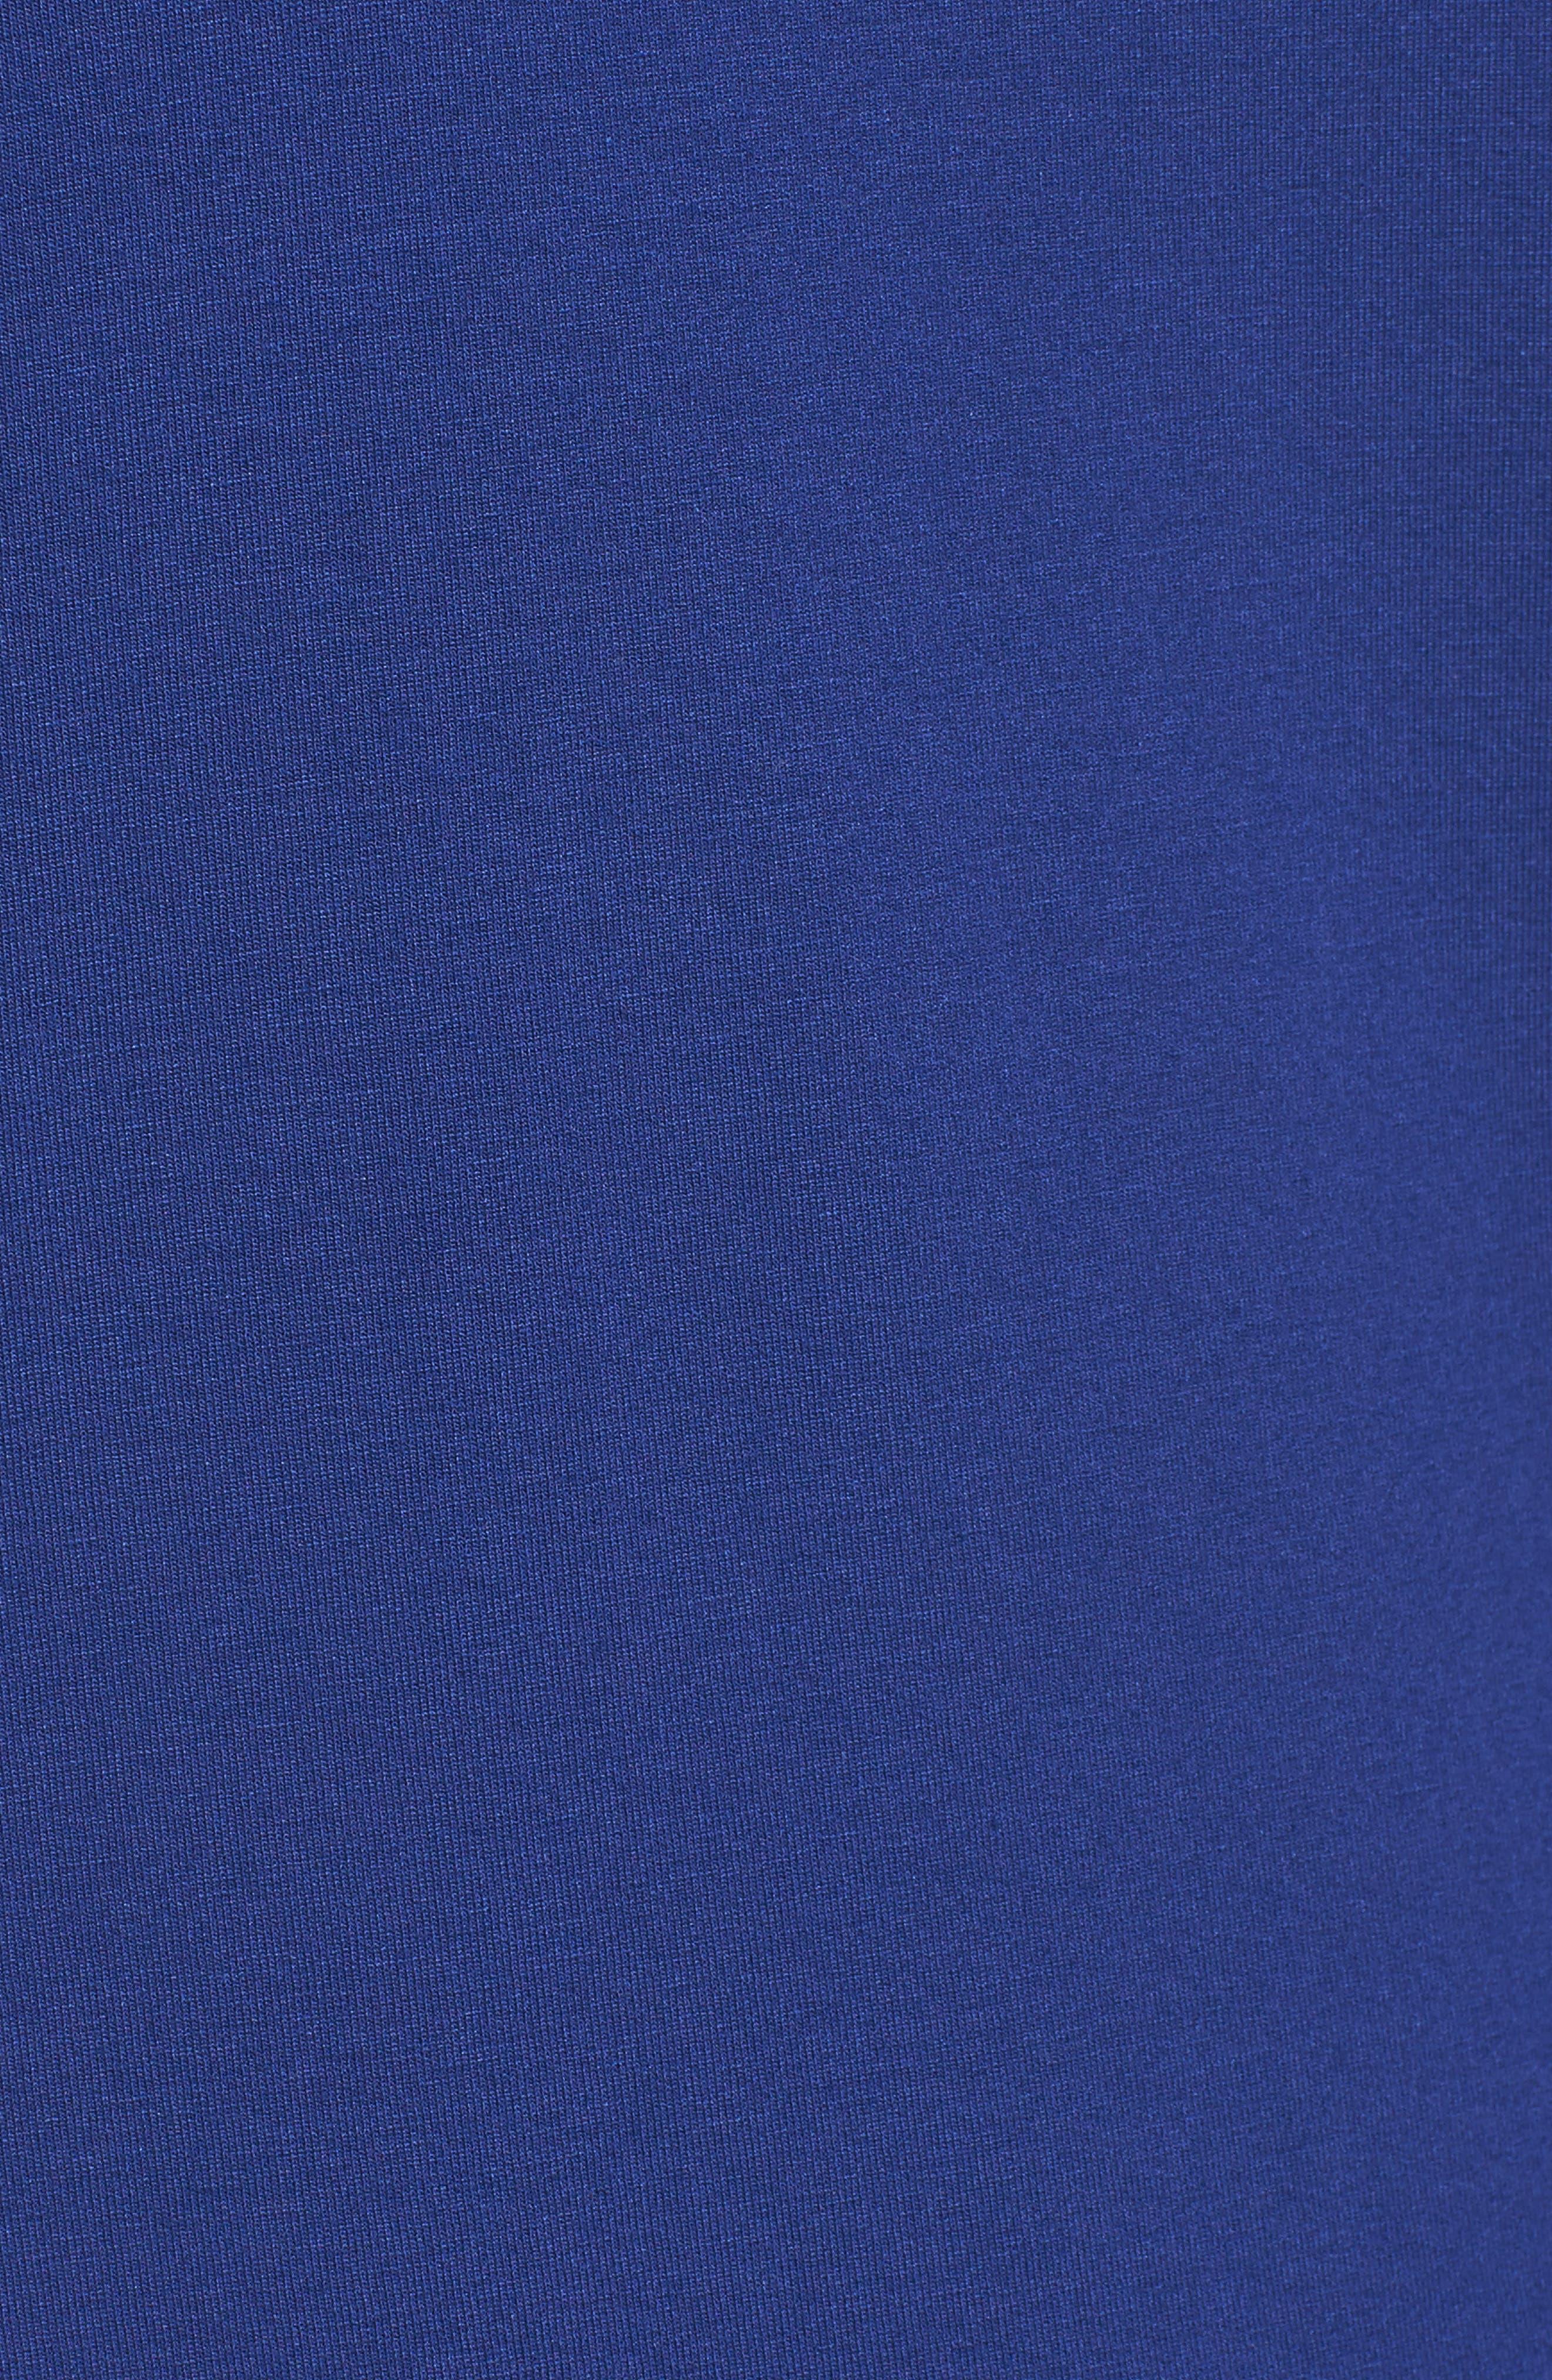 Alternate Image 5  - Eileen Fisher Scrunch Neck Jersey Top (Regular & Petite)